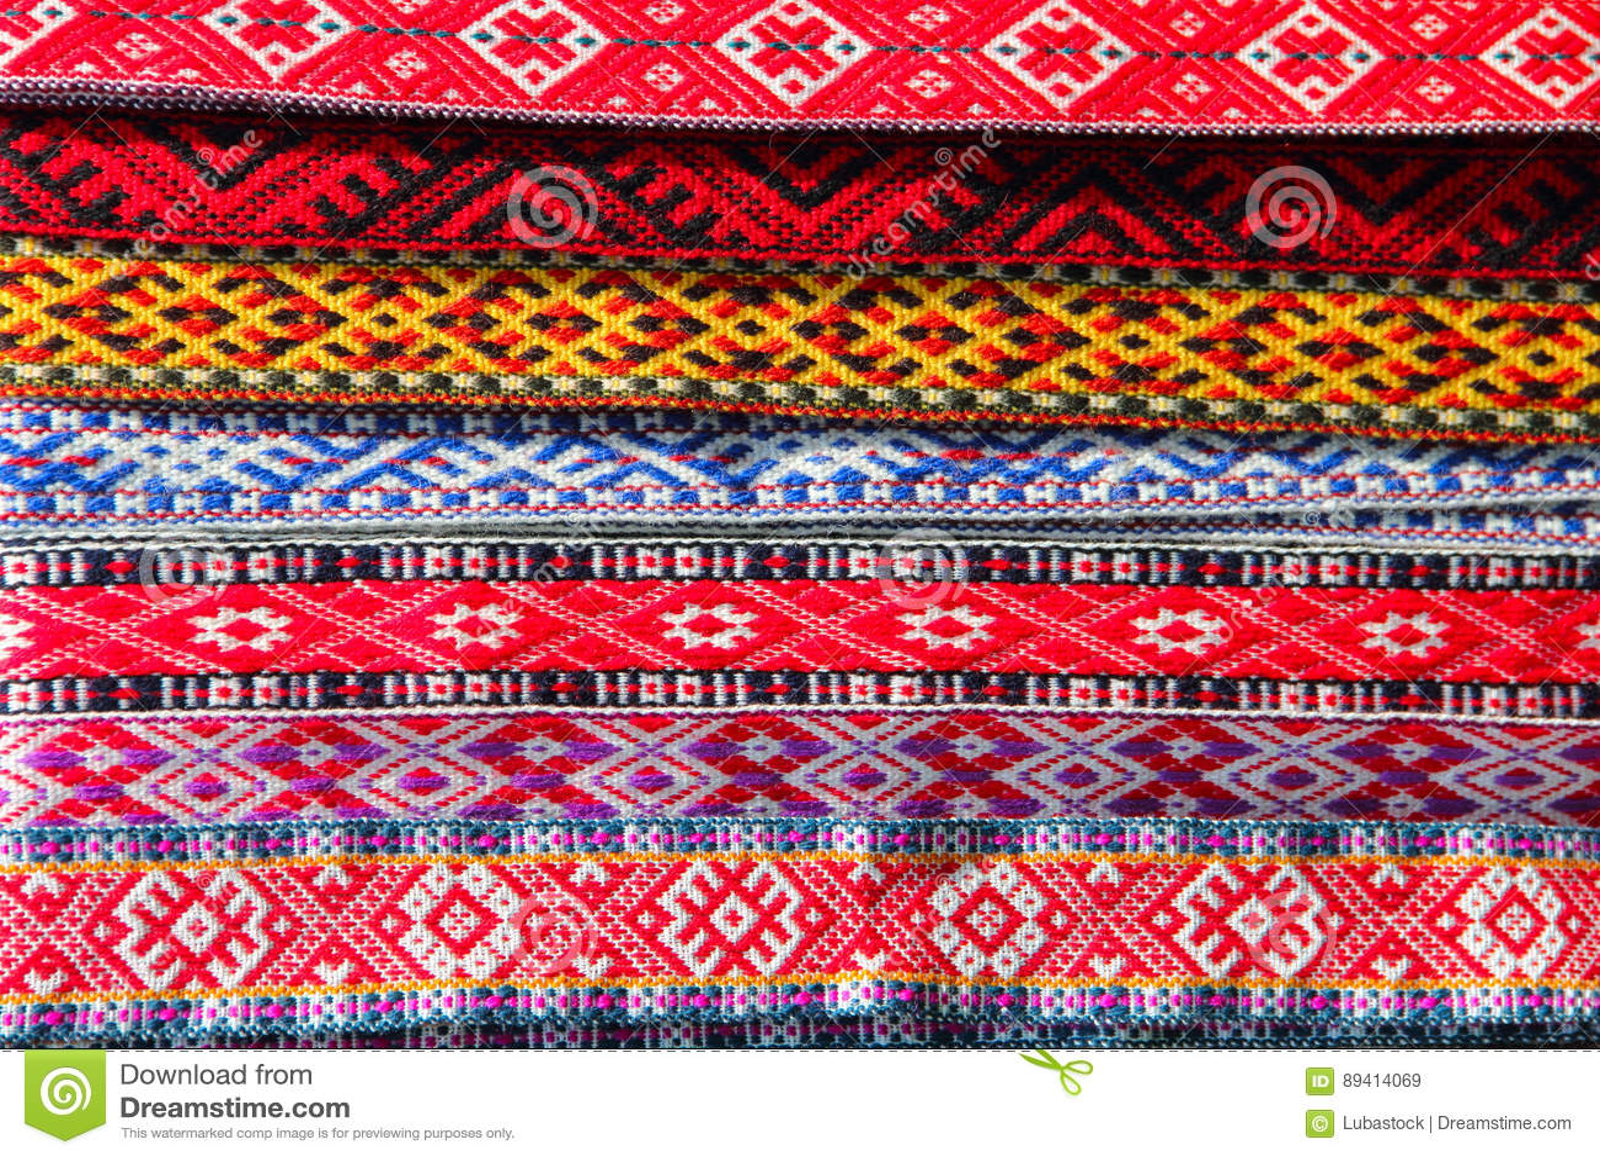 Tela decorativa tradicional